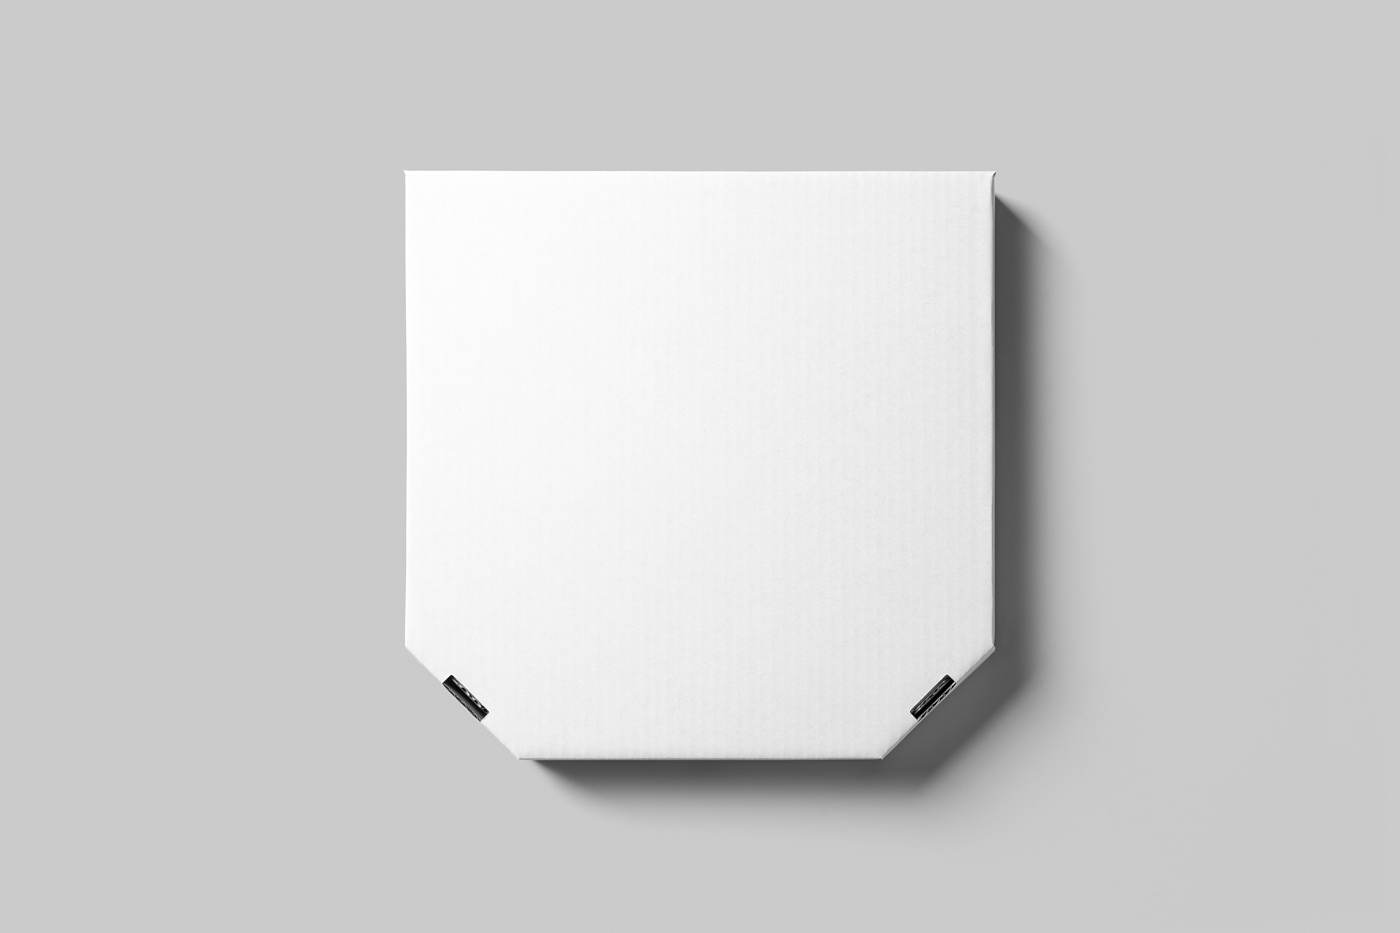 Pizza box downland psd brand free Mockup design visual identity Project